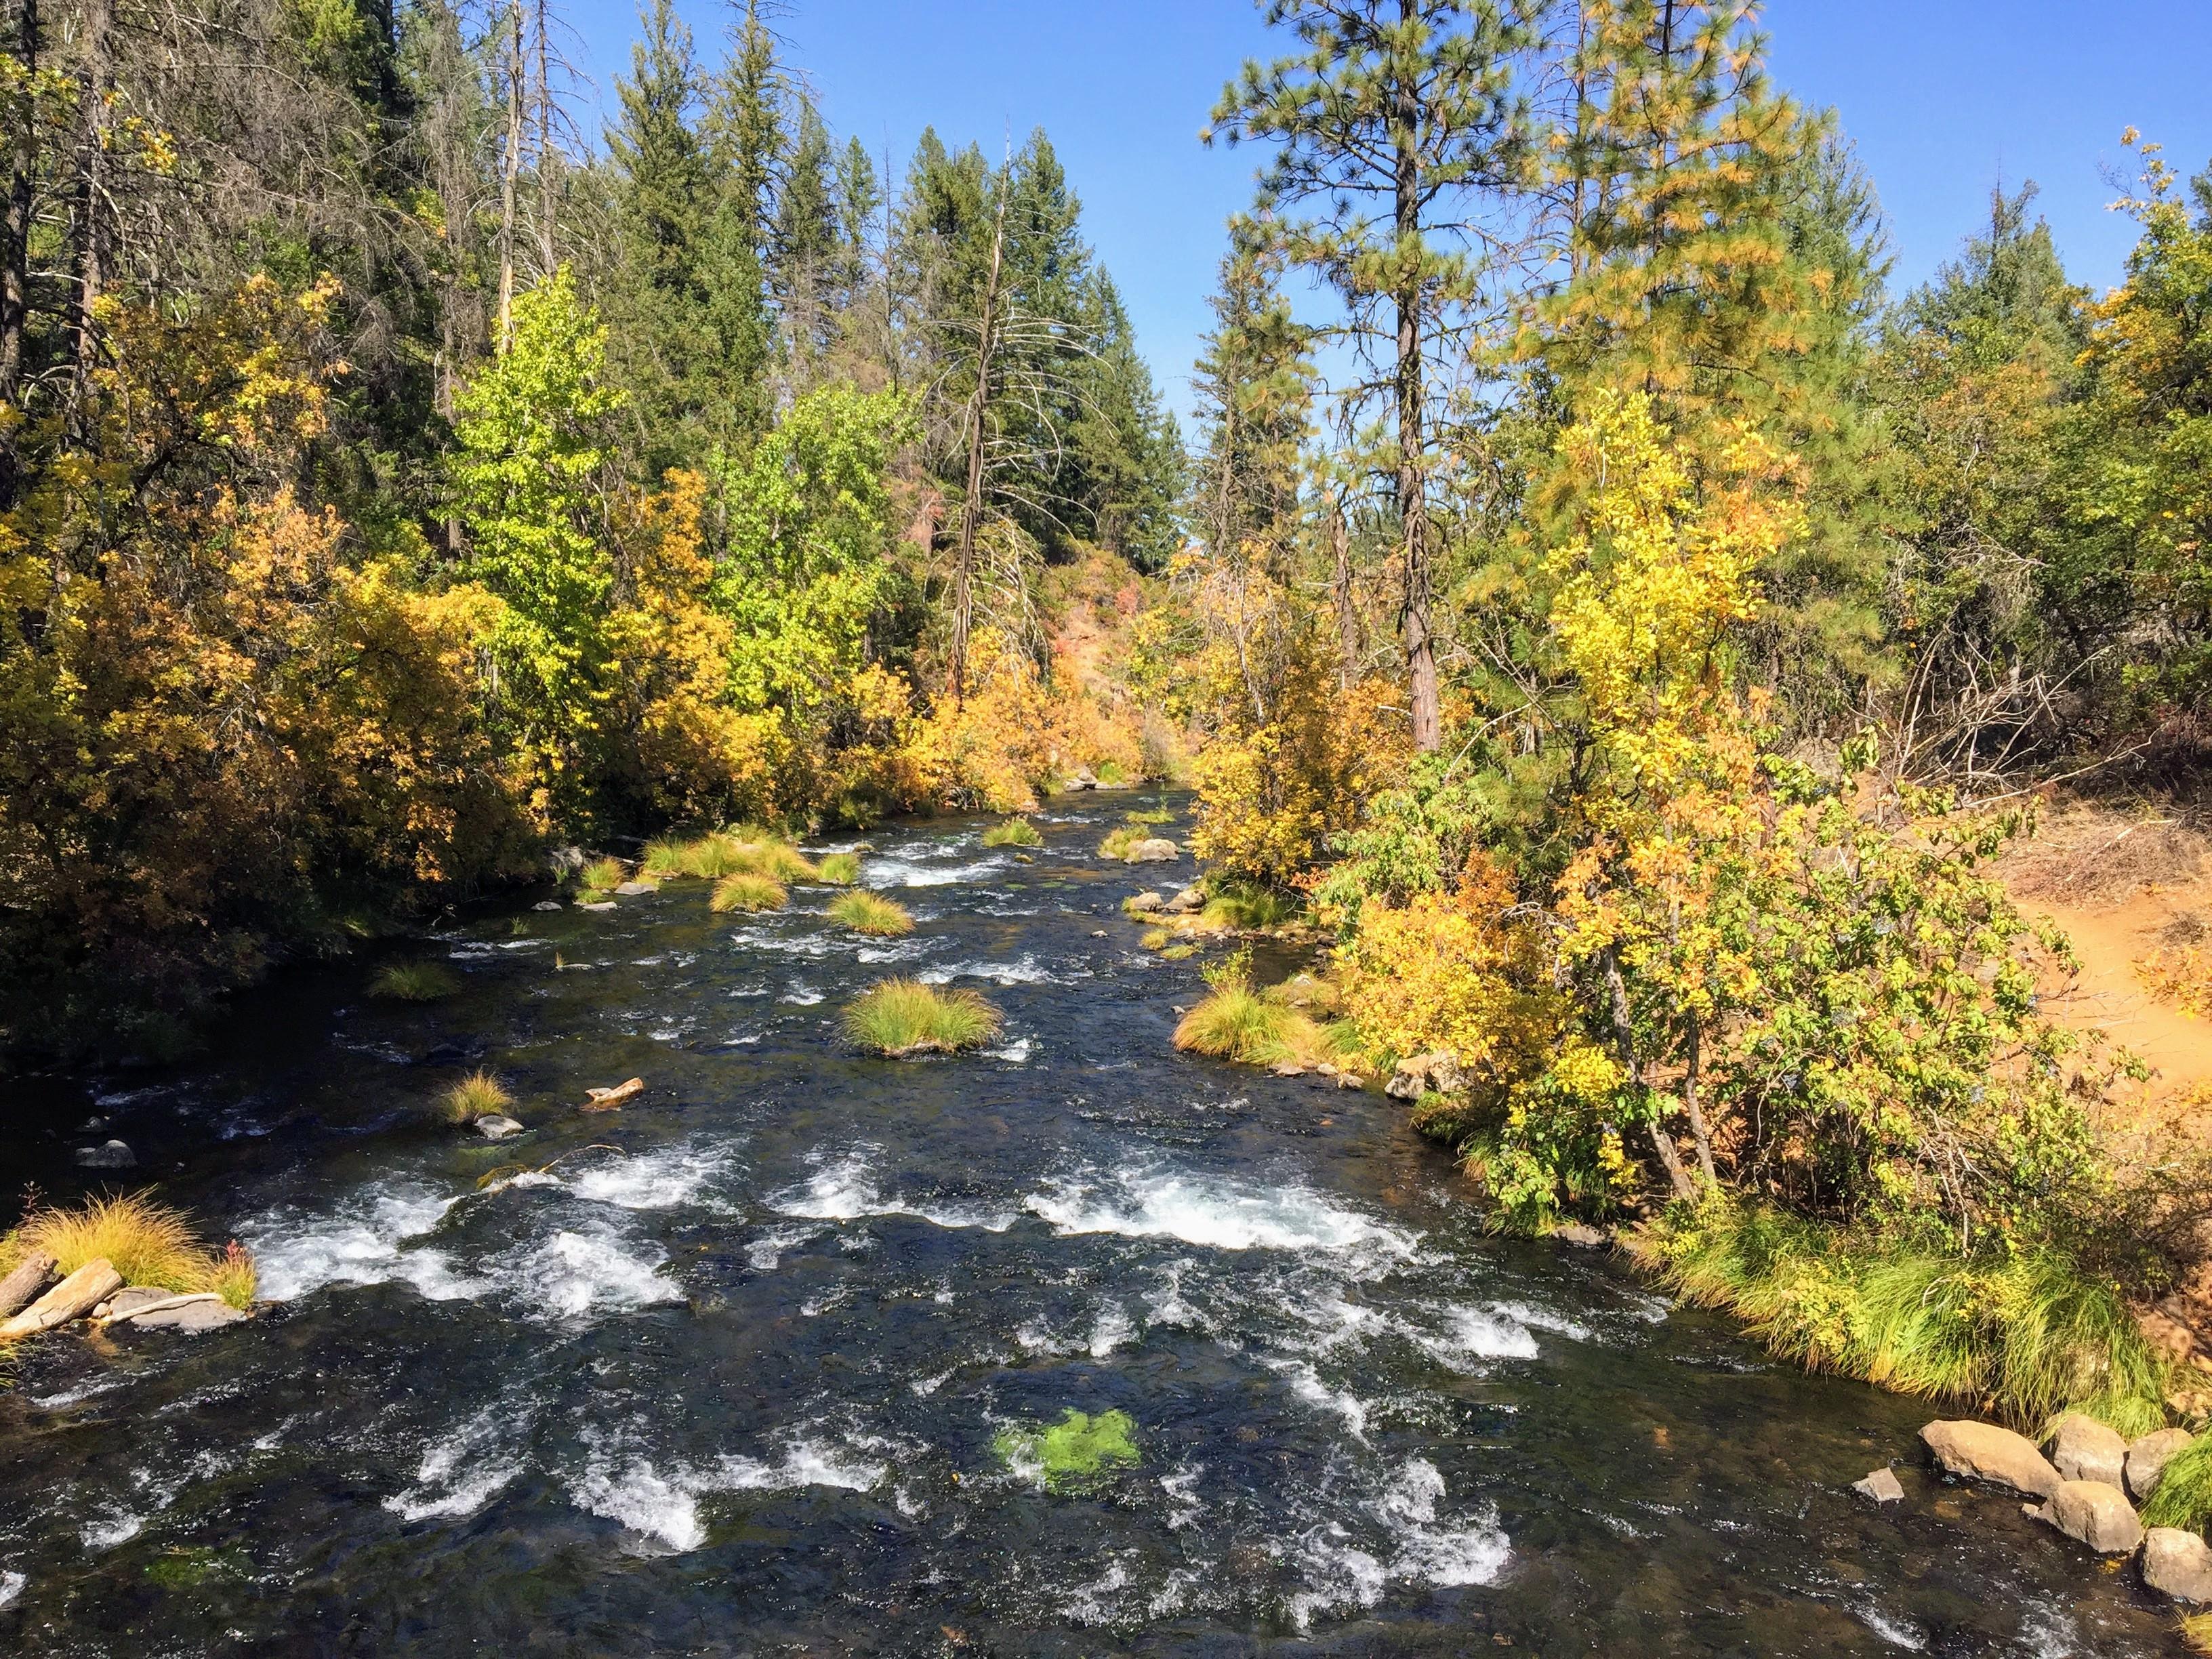 2017-10-05 California 02 Burney Falls 03